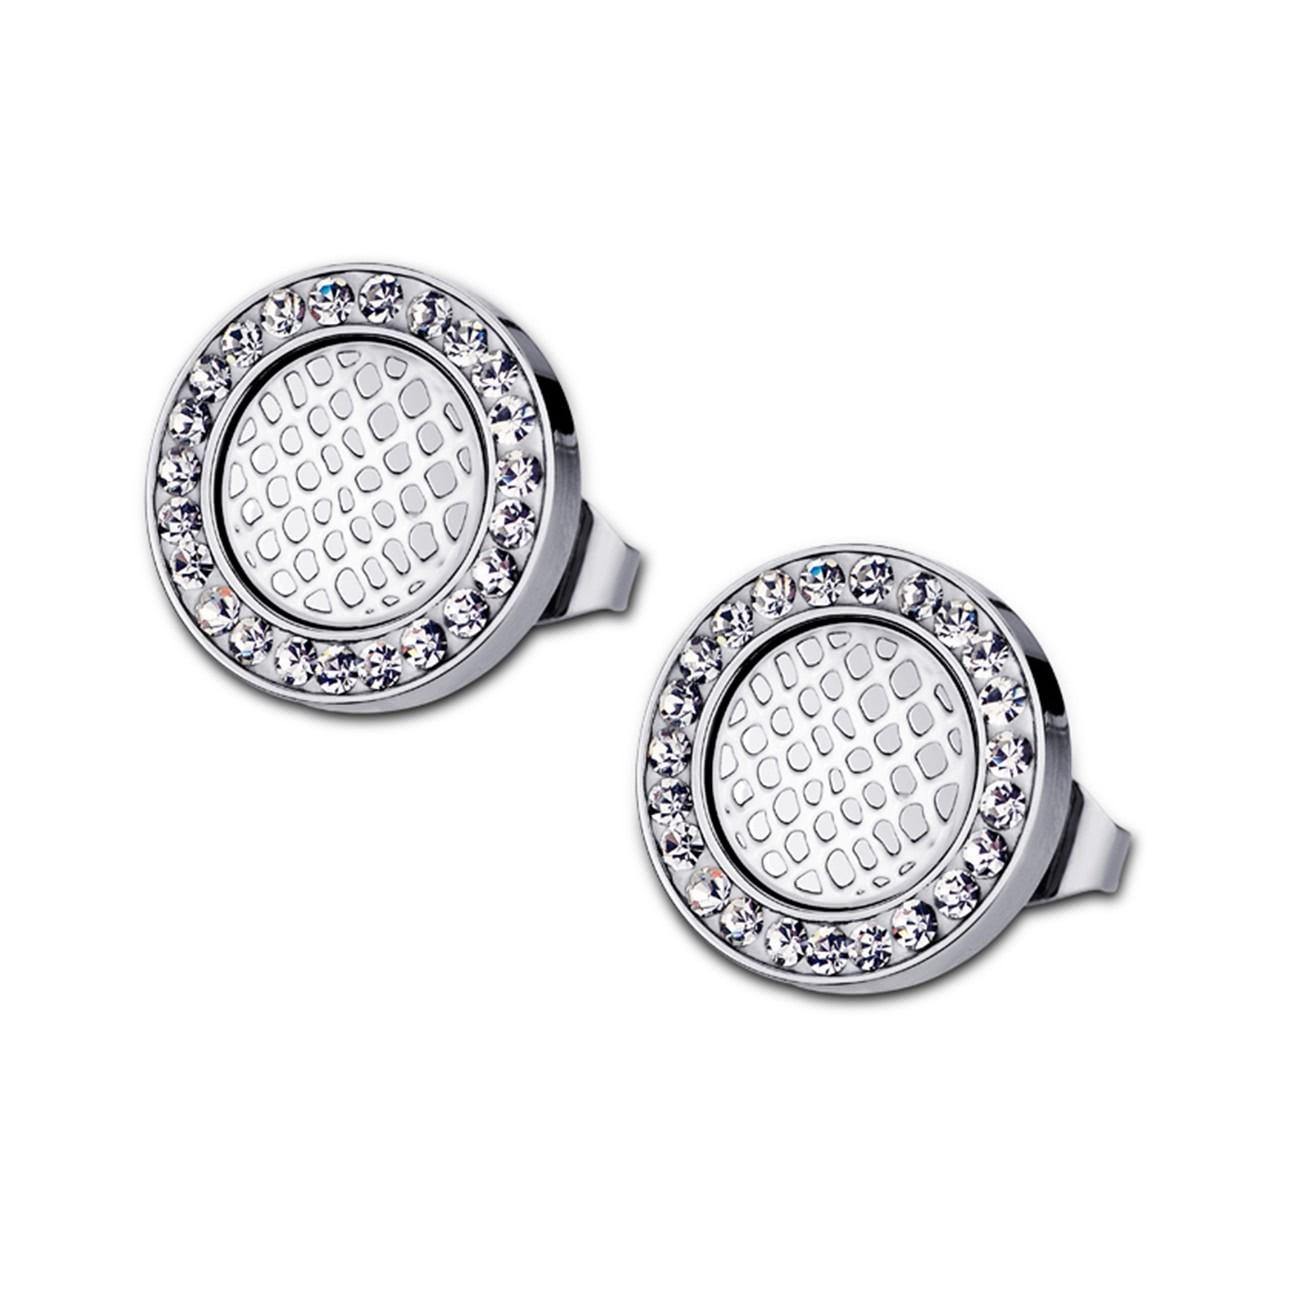 LOTUS Style Ohrringe Damen Edelstahl silber LS1778-4/1 Ohrstecker JLS1778-4-1